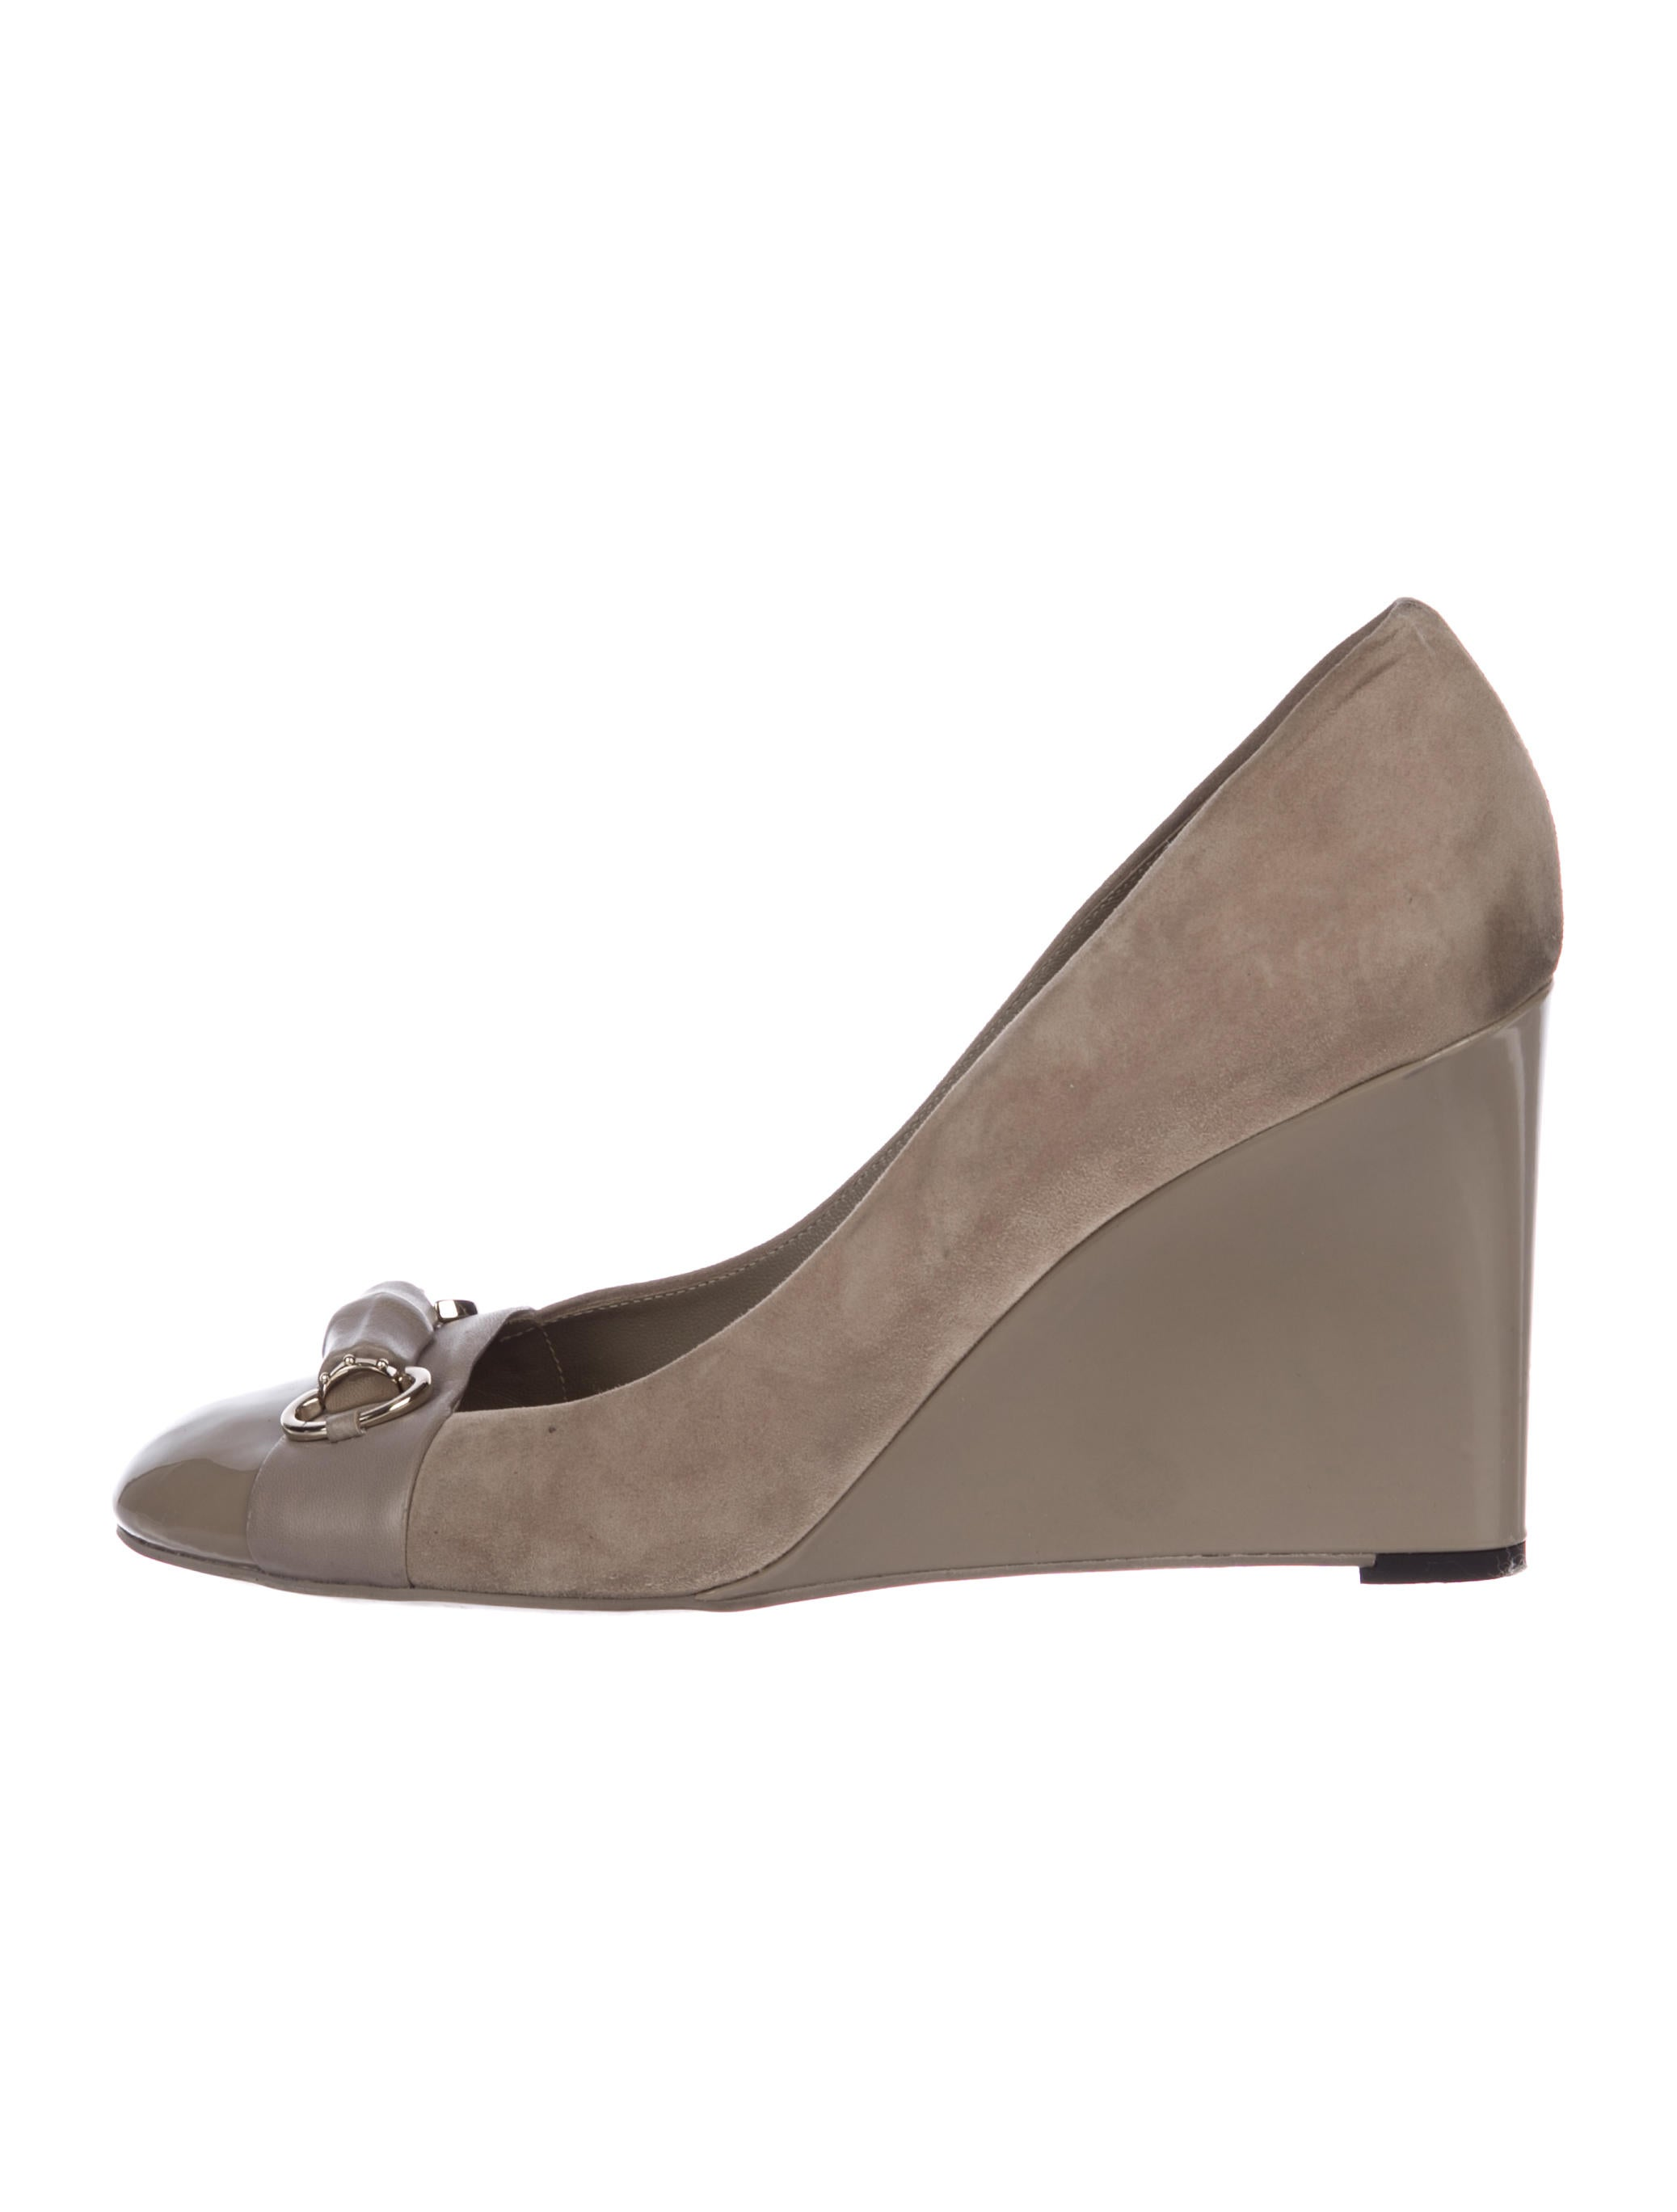 3ddb13292789 Gucci Horsebit Suede Wedges - Shoes - GUC220326